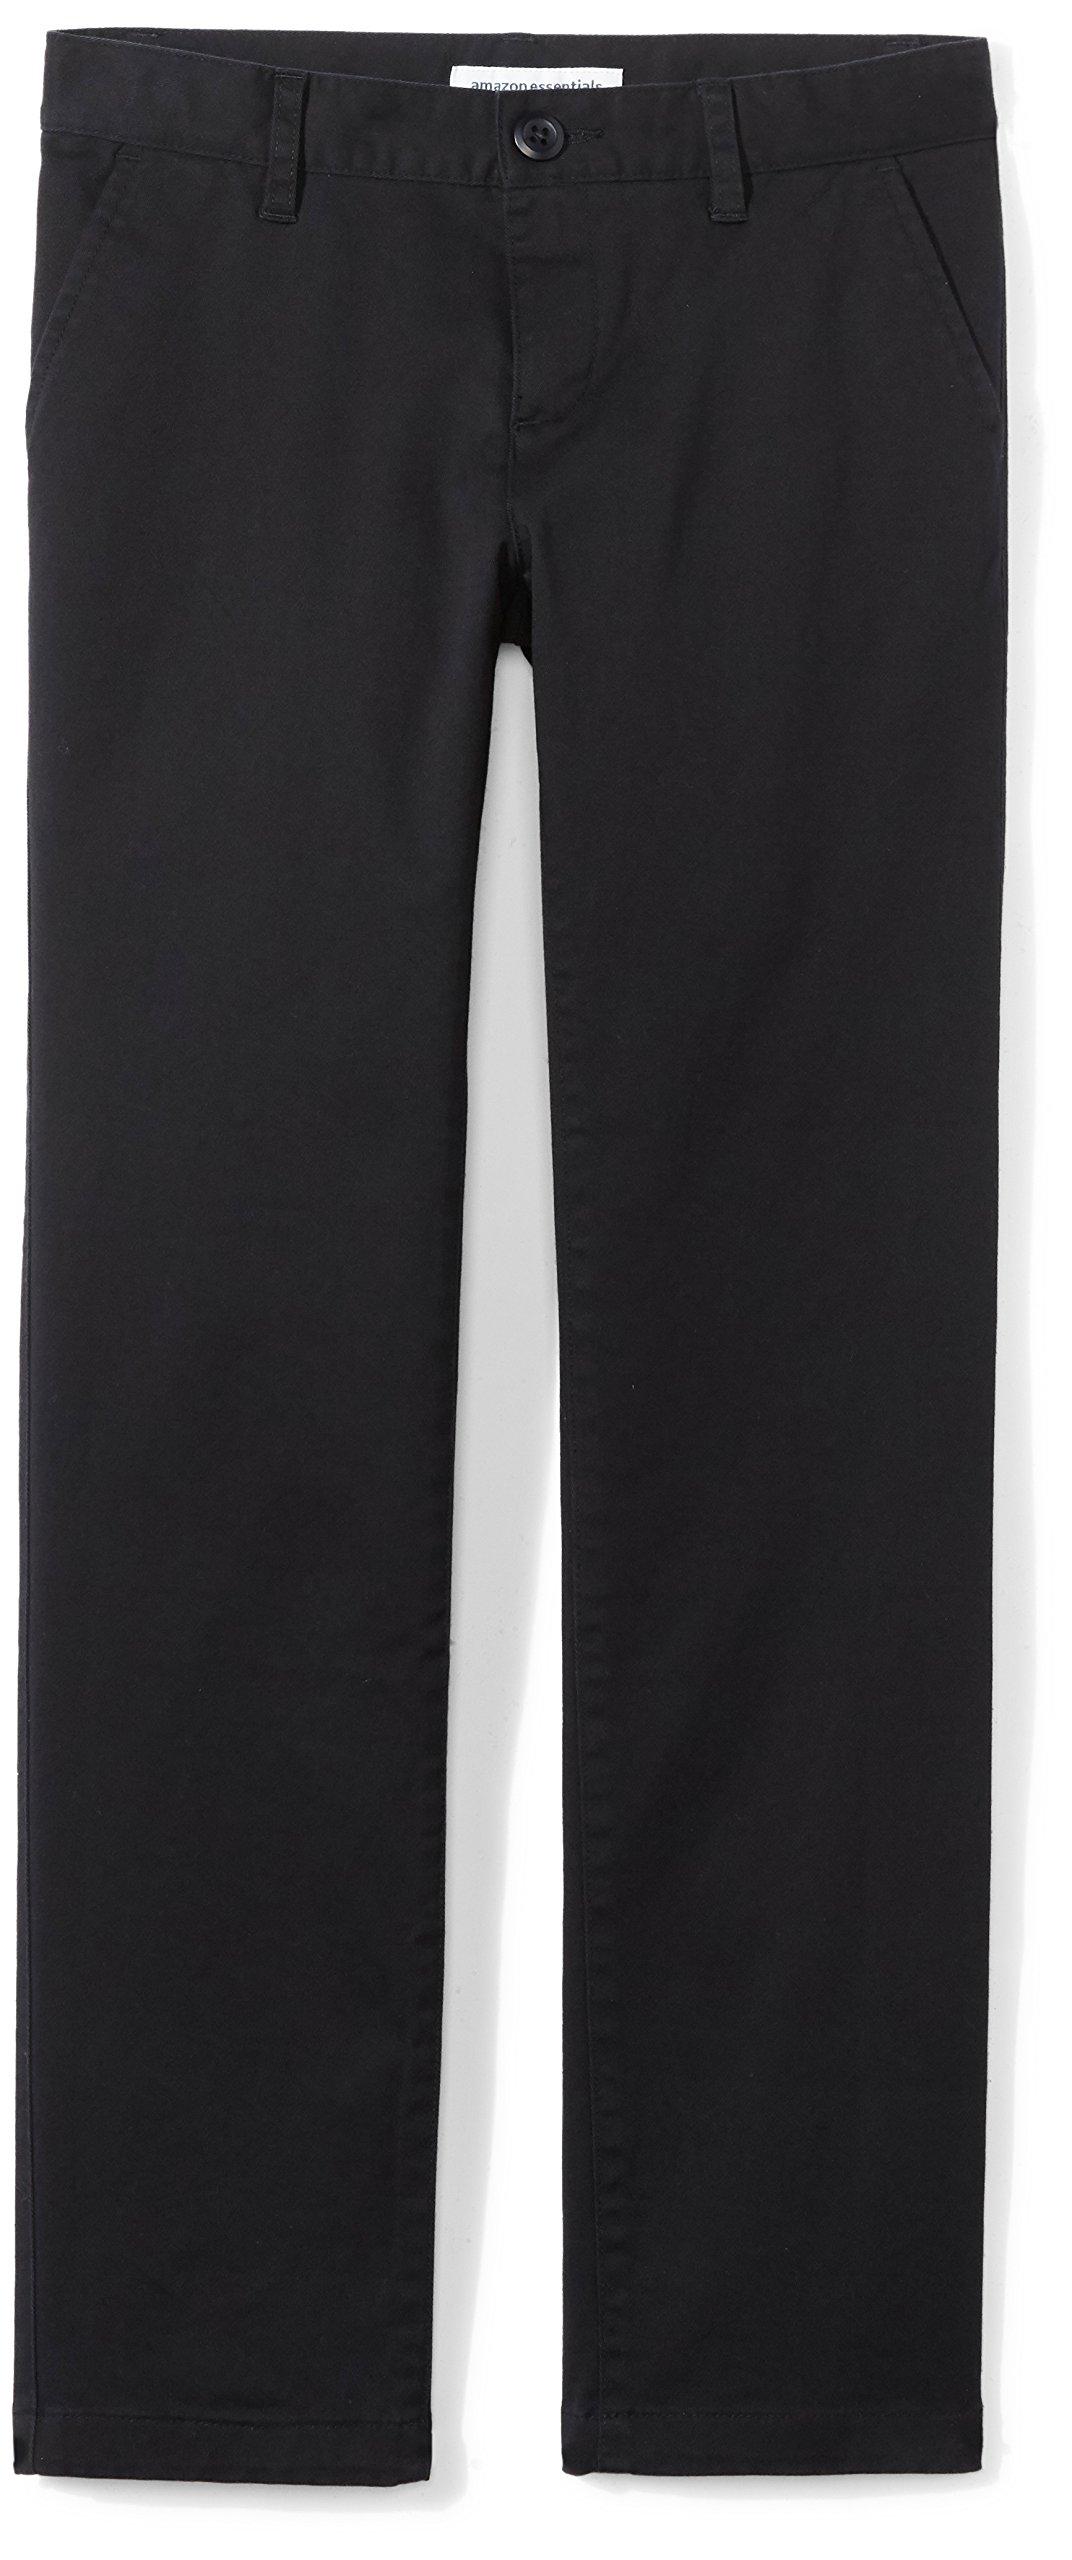 Amazon Essentials Girls' Flat Front Uniform Chino Pant, Black,12